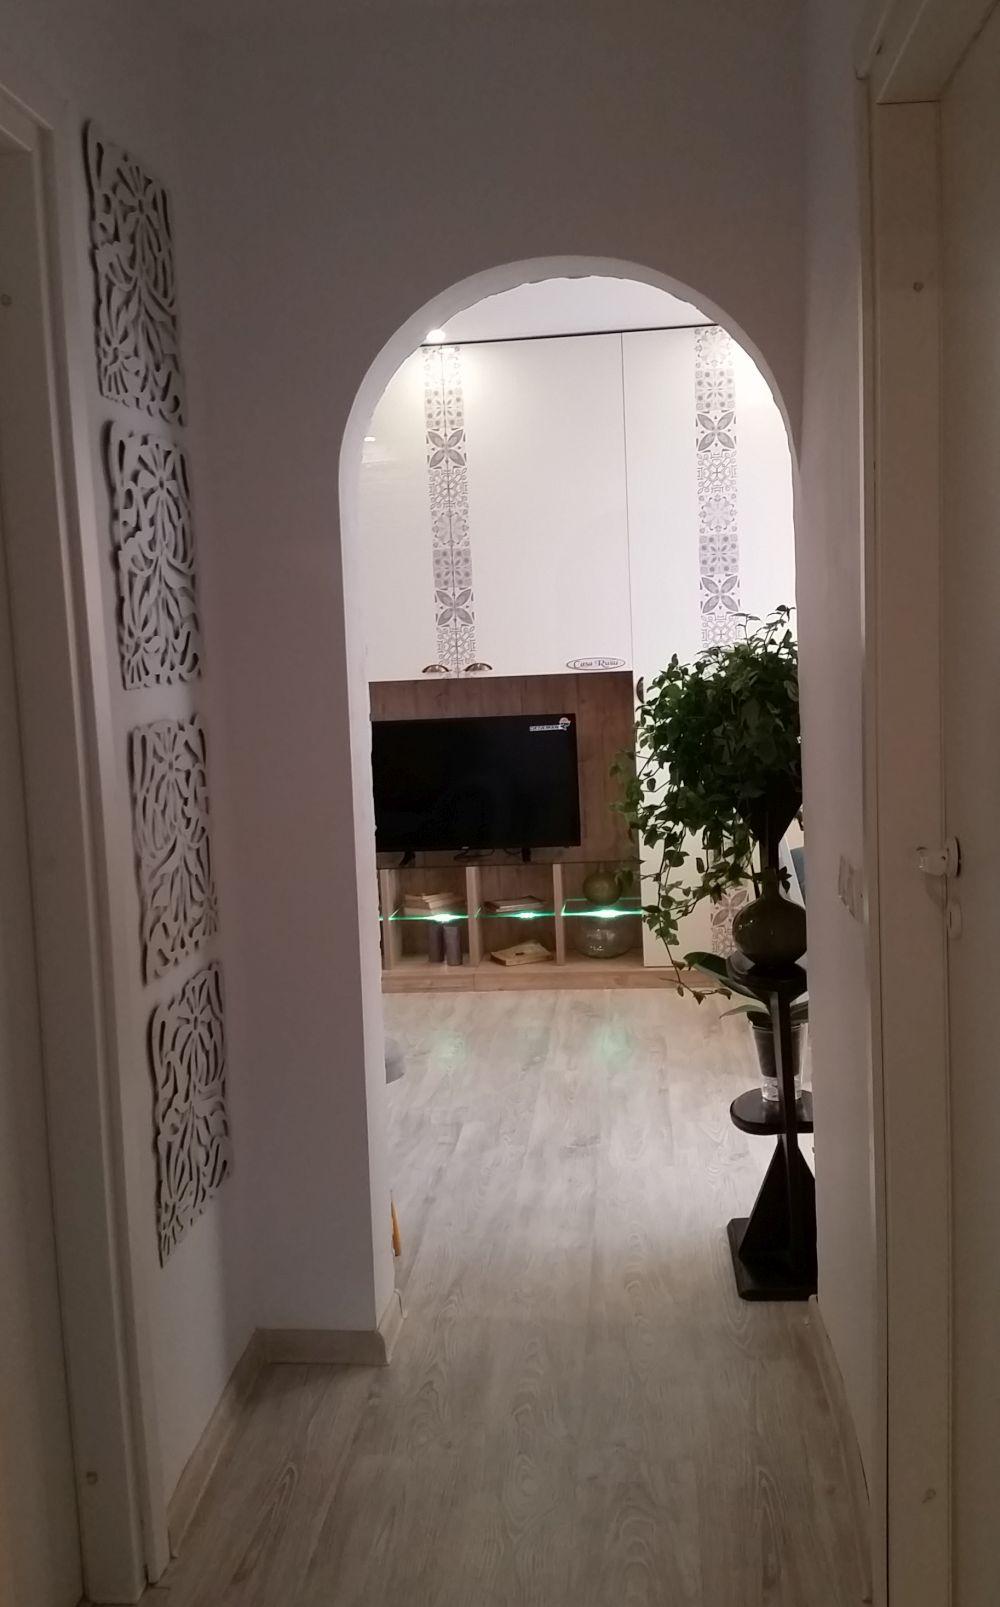 adelaparvu-com-despre-apartamentul-familiei-tudorache-ploiesti-episodul-9-sezonul-3-visuri-la-cheie-foto-adela-parvu-14